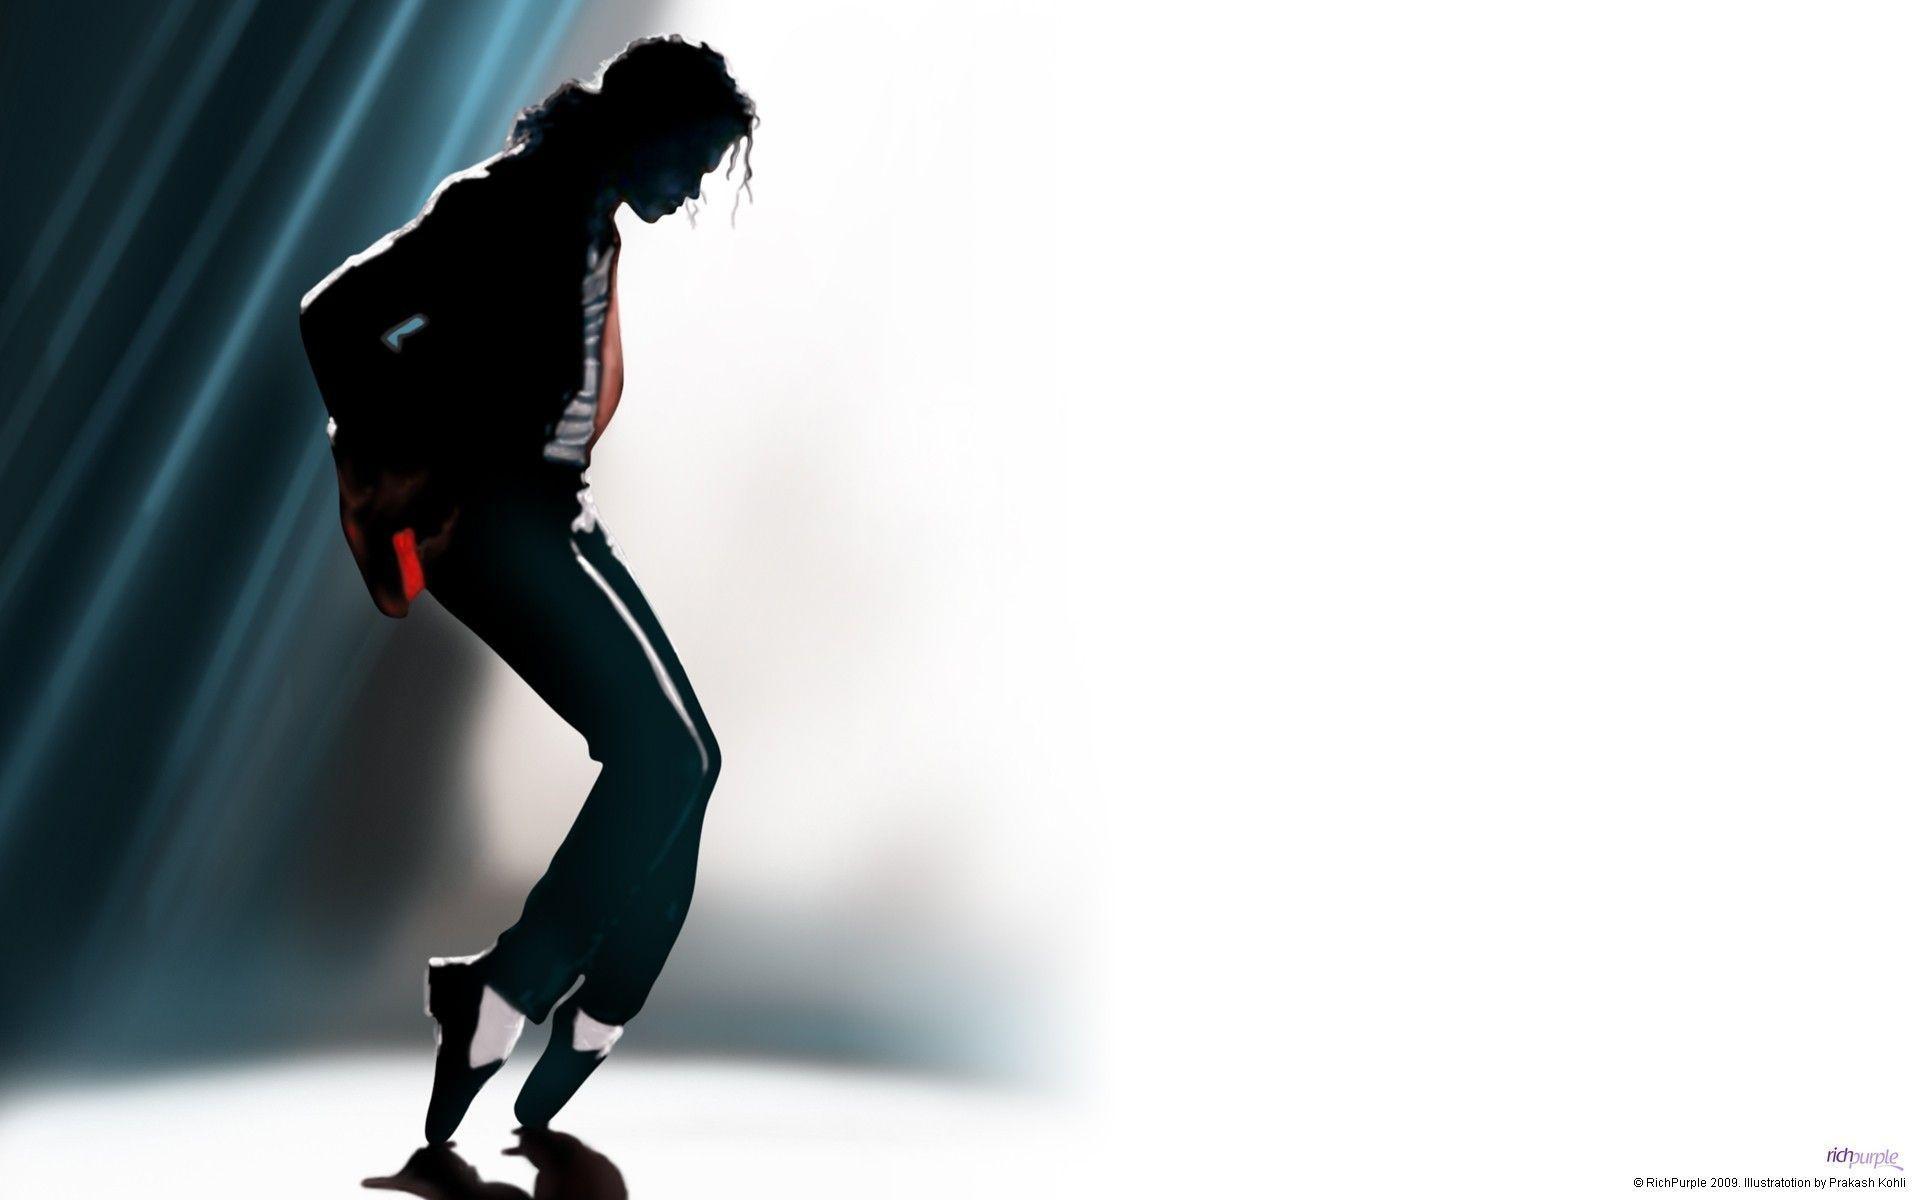 Michael Jackson Wallpapers Top Free Michael Jackson Backgrounds